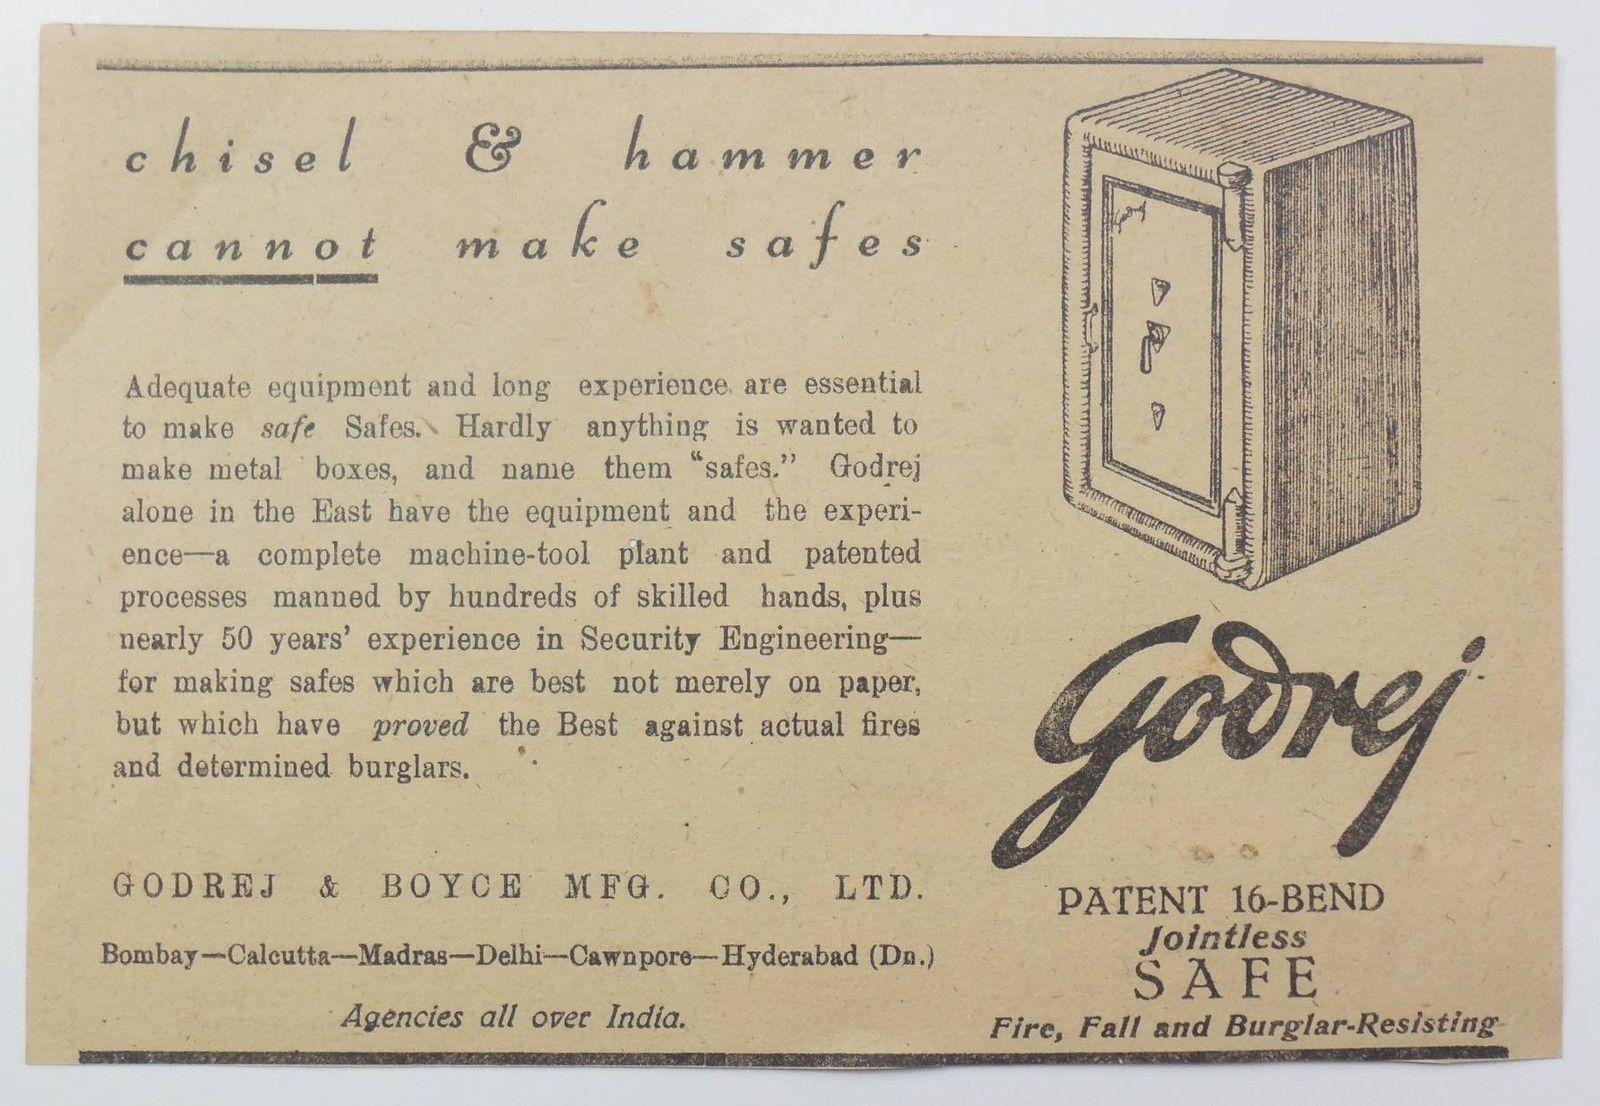 http://www.ebay.com/itm/Vintage-1944-Ad-Print-Godrej-Chisel-Hammer ...